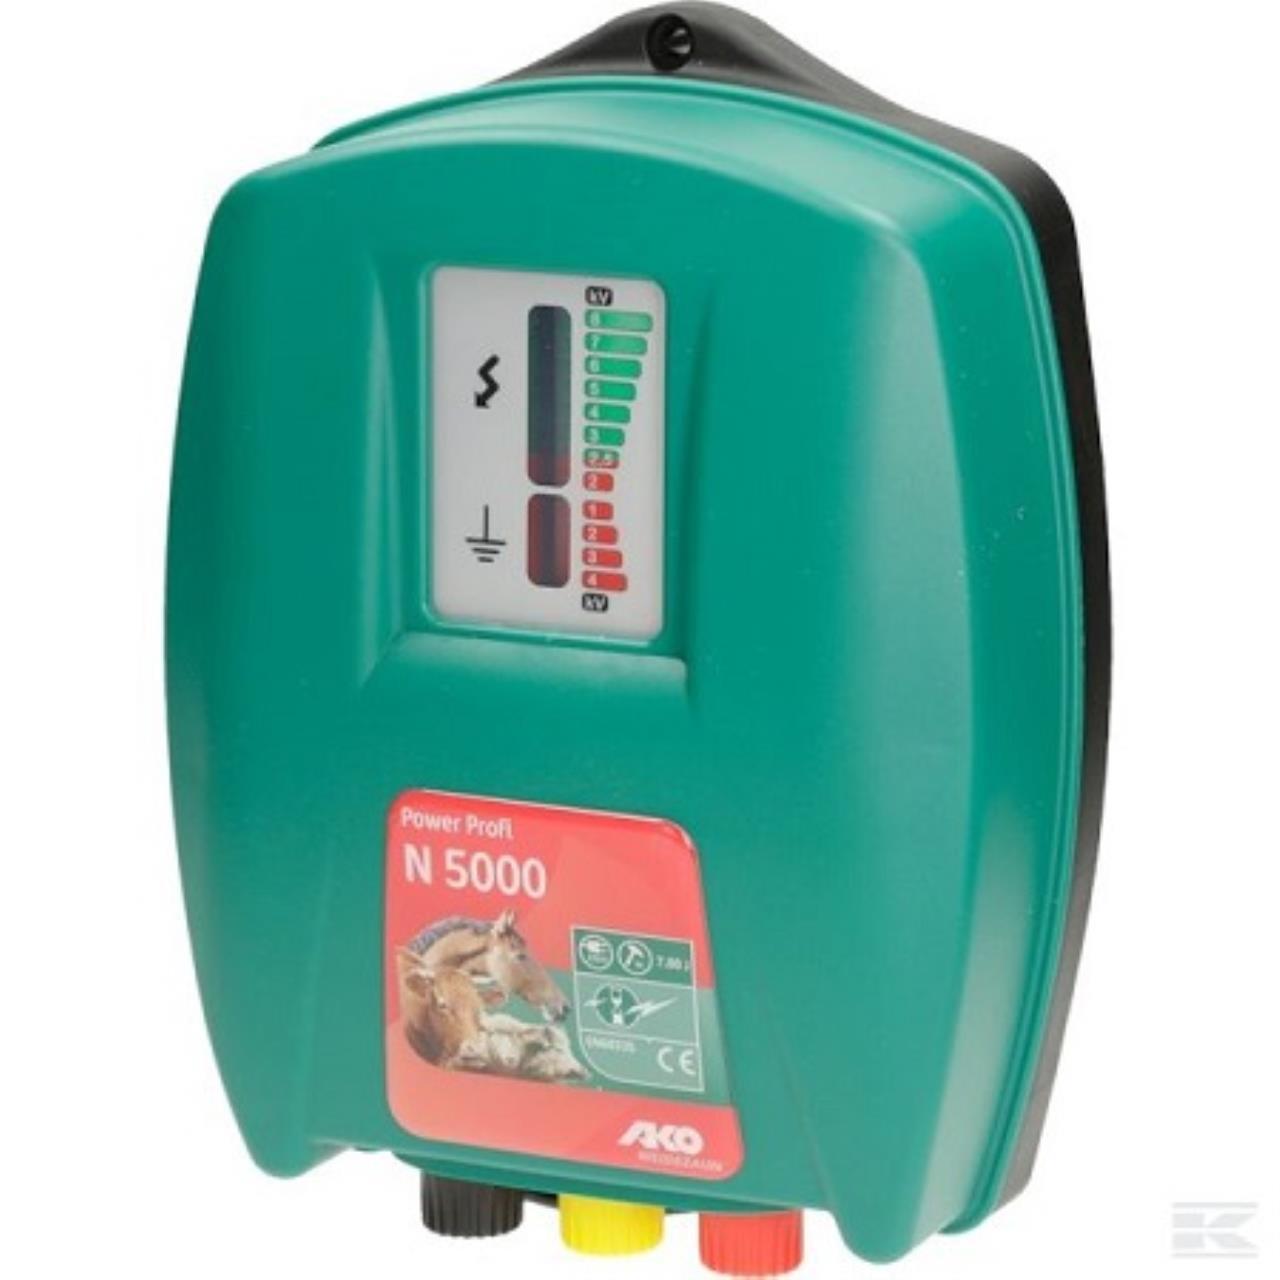 AKO El-hegn Powerprofi N5000